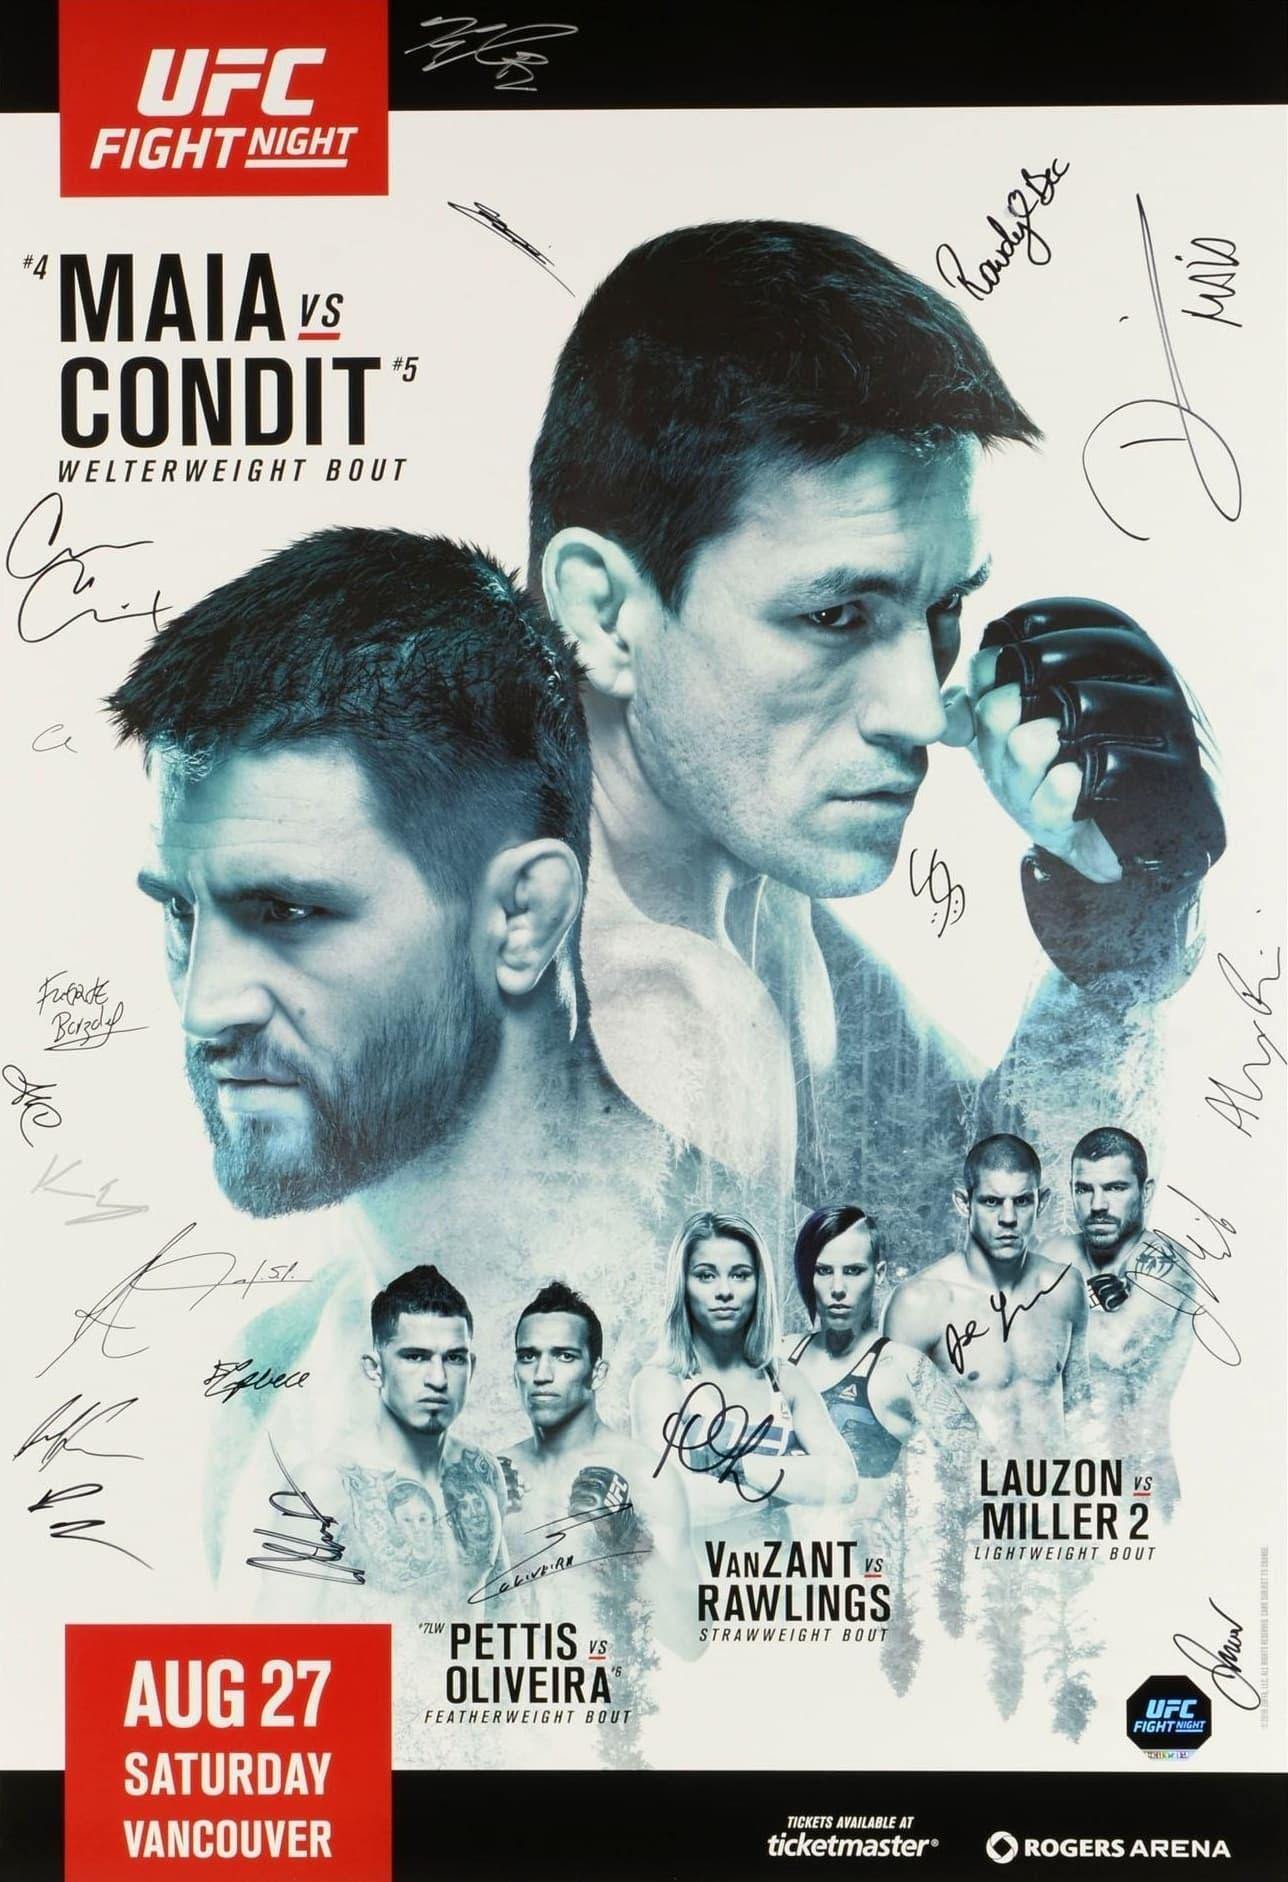 UFC on Fox 21: Maia vs. Condit